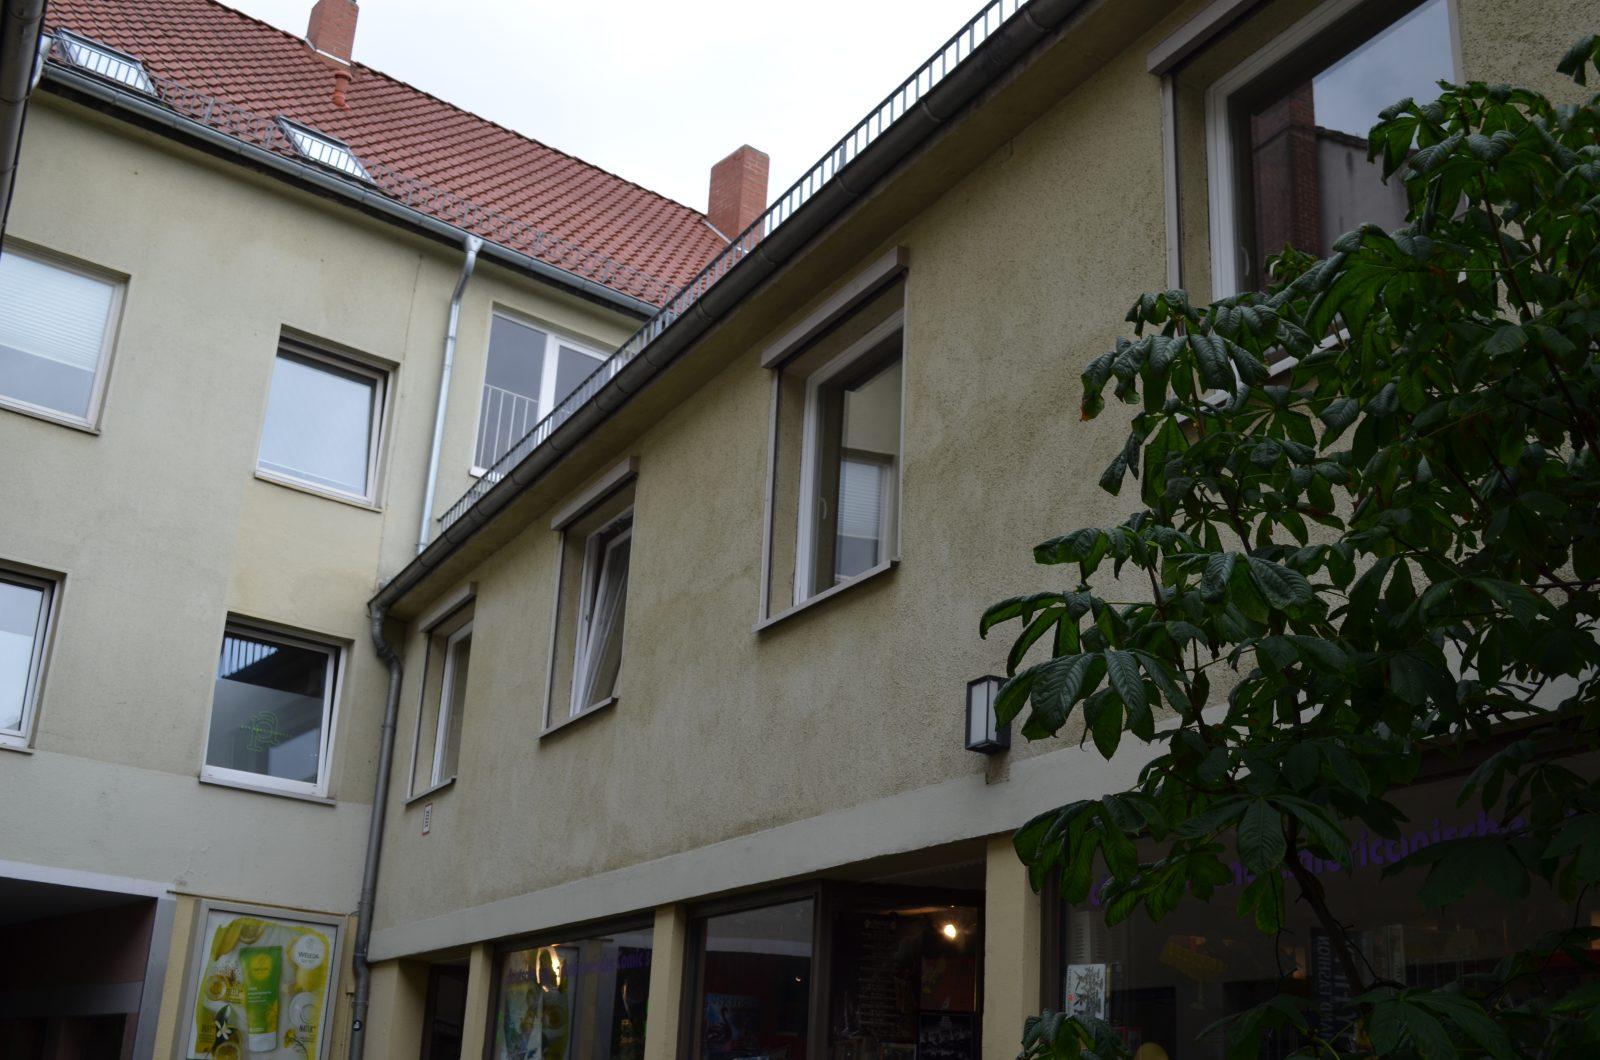 Vermietung archive ik immobilien for Immobilien mietwohnung